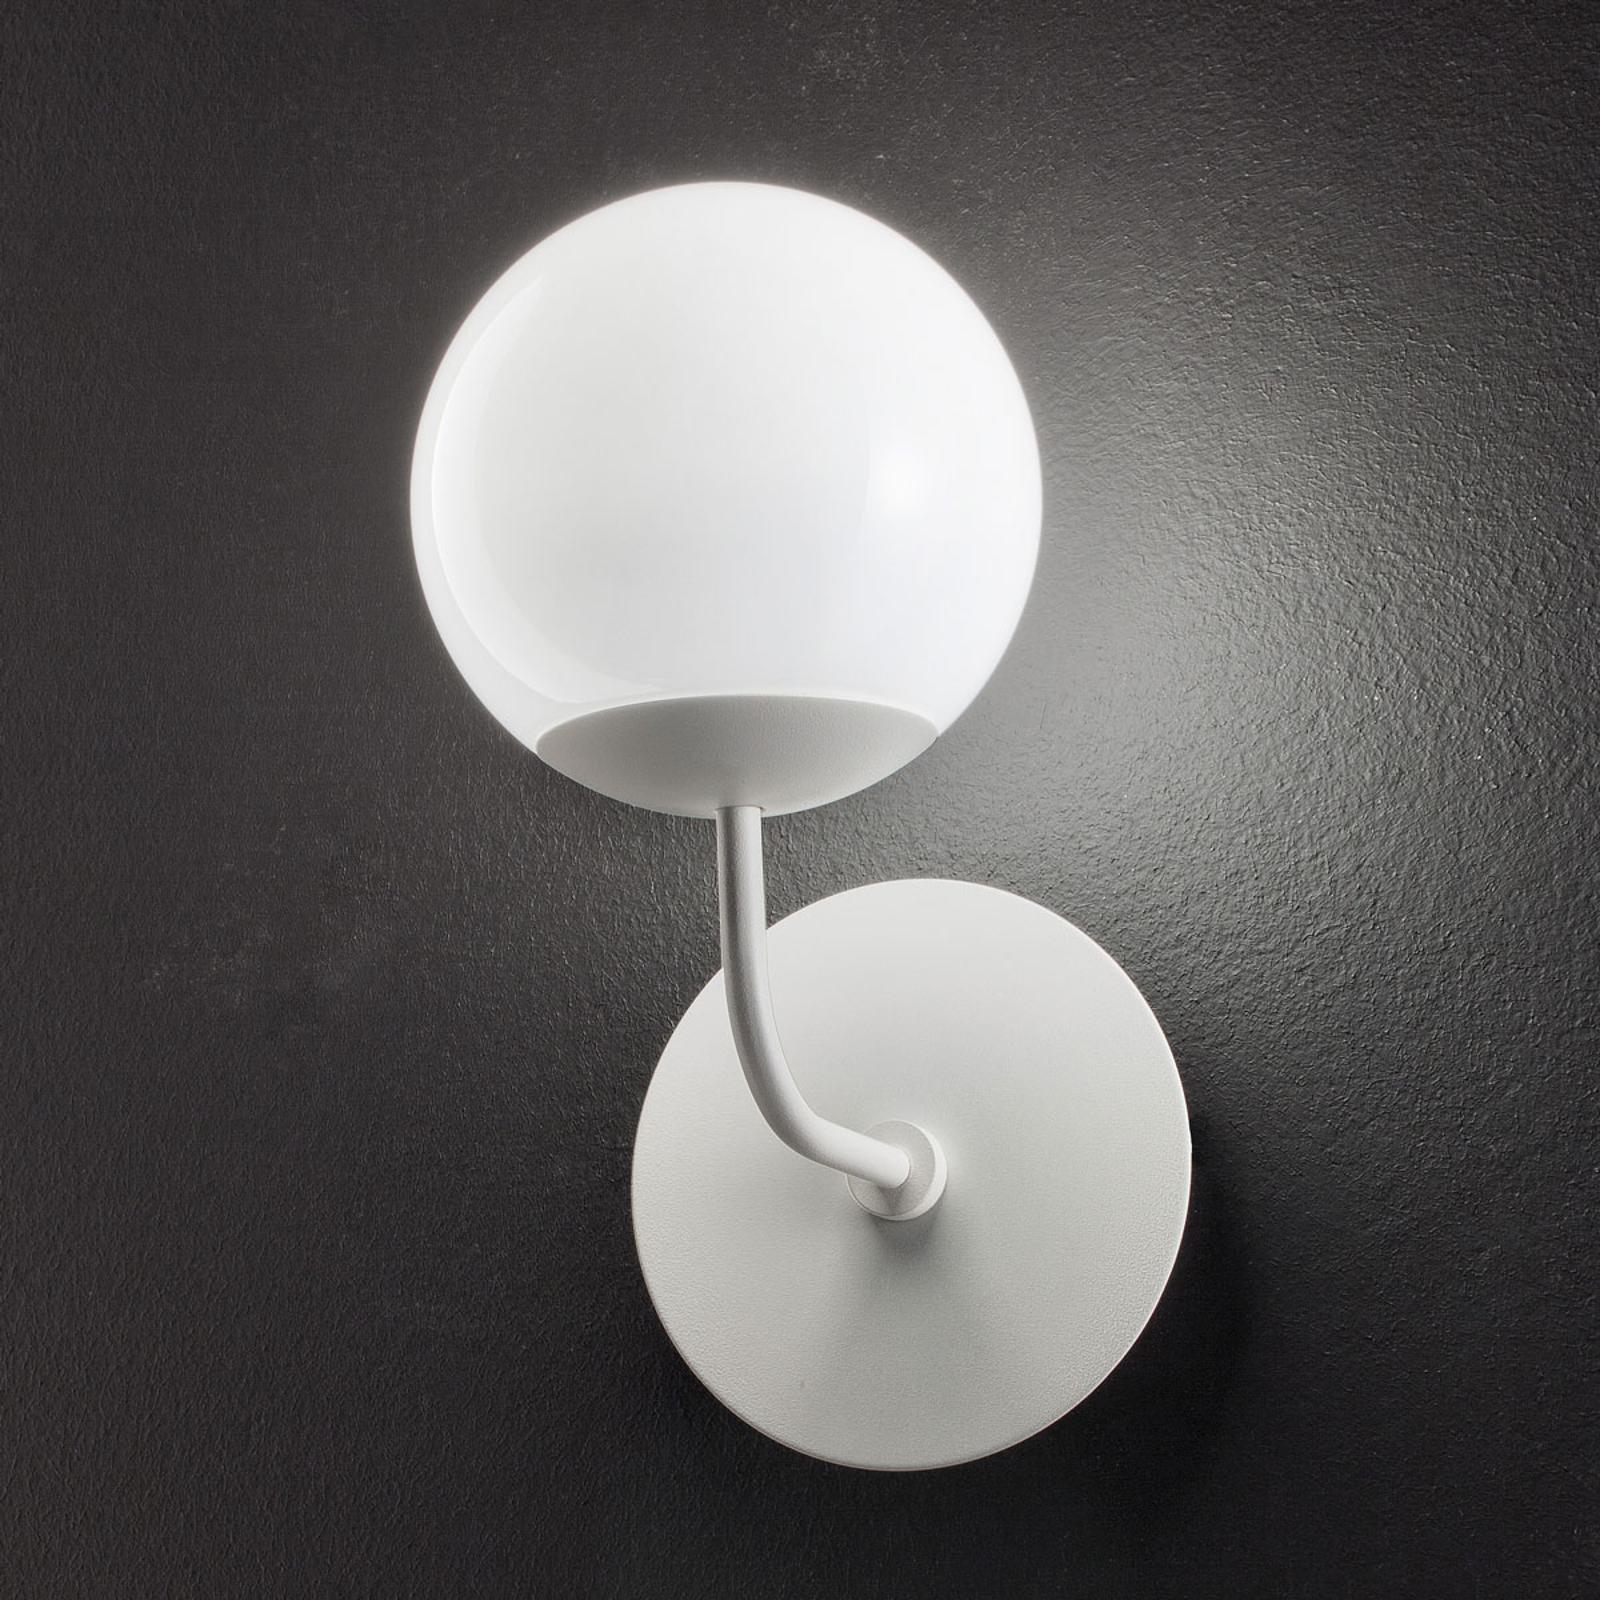 Rund LED-vegglampe Sfera